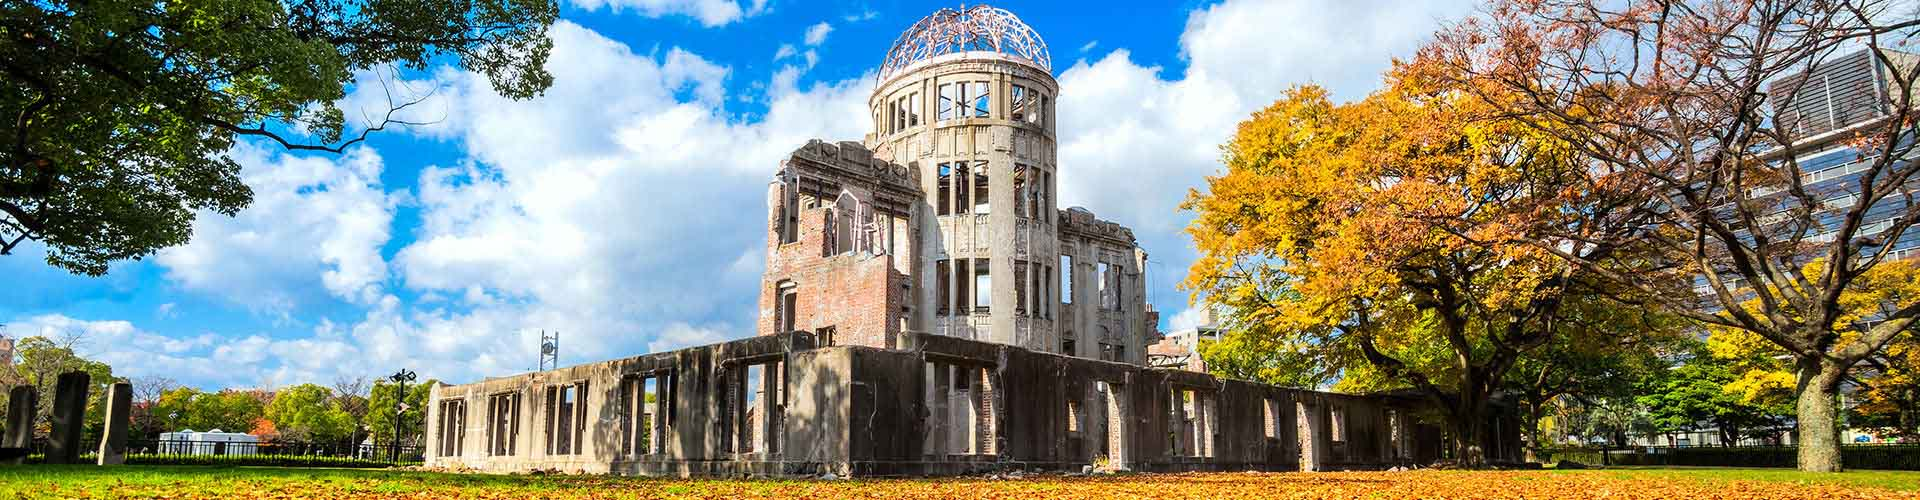 Hiroshima - Camping à Hiroshima. Cartes pour Hiroshima, photos et commentaires pour chaque Camping à Hiroshima.